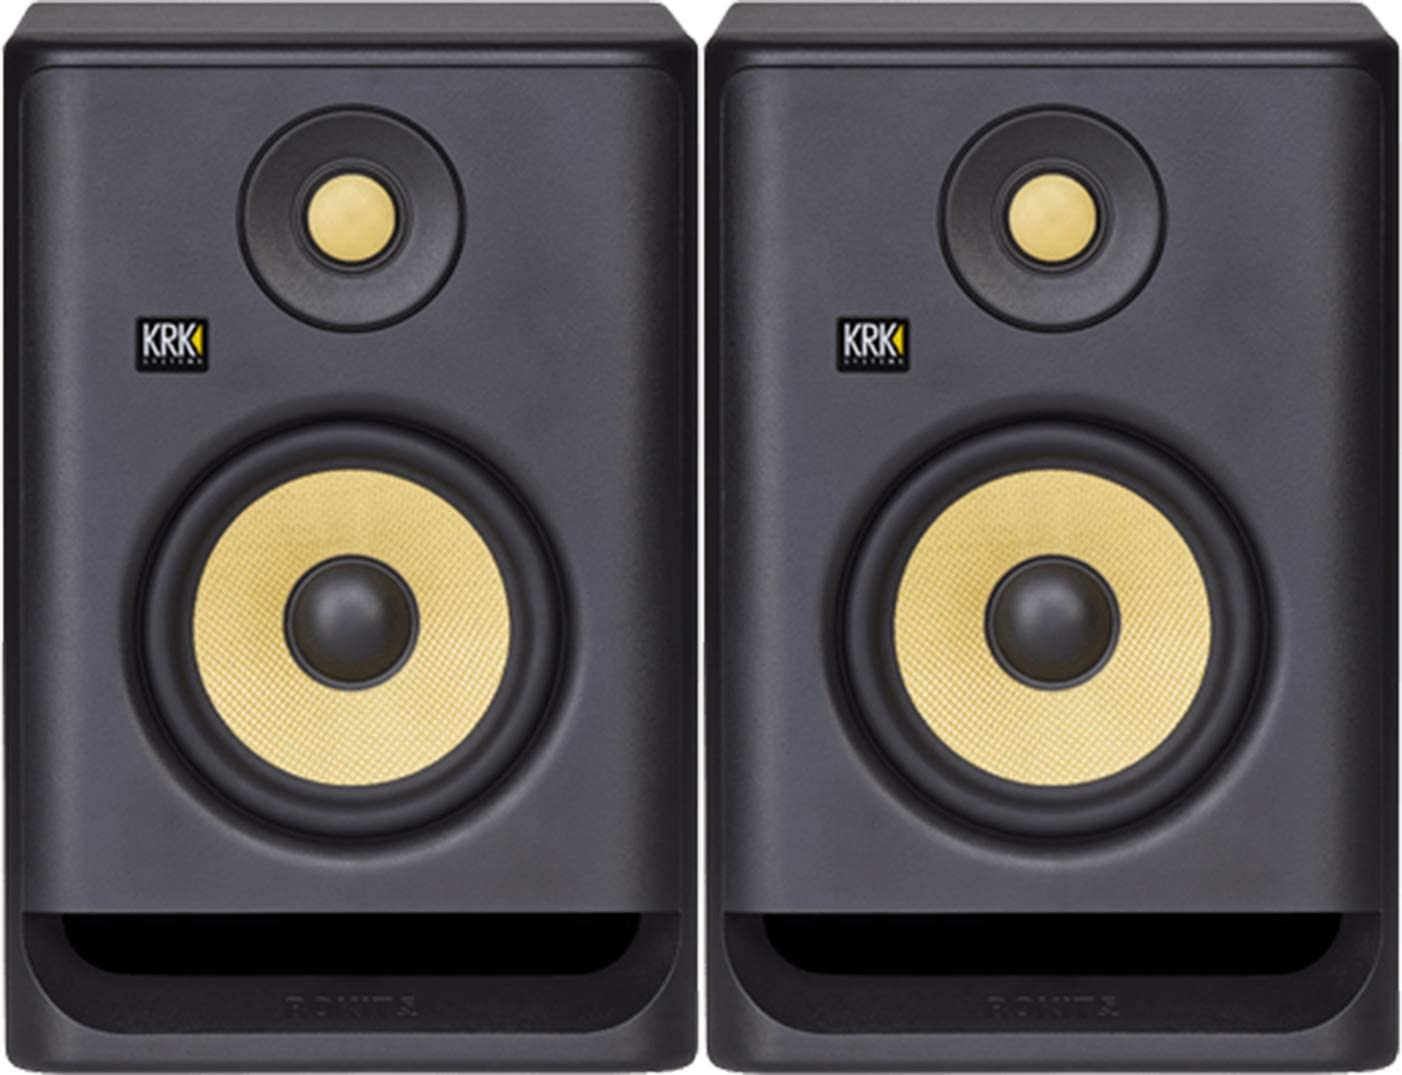 KRK Rokit Studio Monitor Lautsprecher, 2 Stück Rokit 5 G4: Amazon.de: MP3 &  Hifi